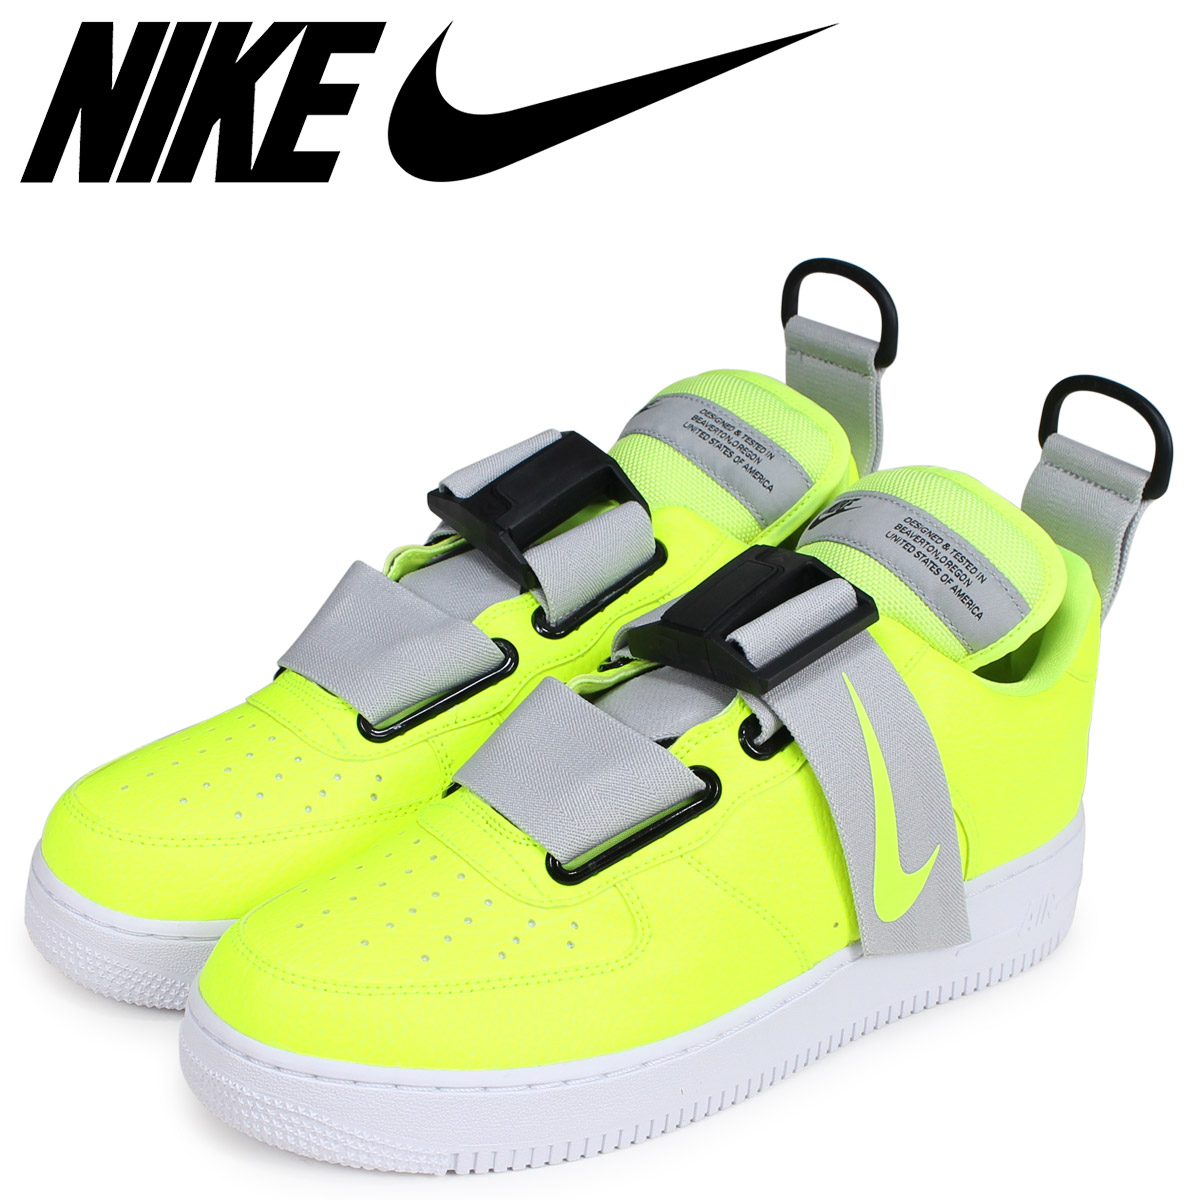 NIKE Nike air force 1 sneakers men AIR FORCE 1 UTILITY yellow AO1531 700